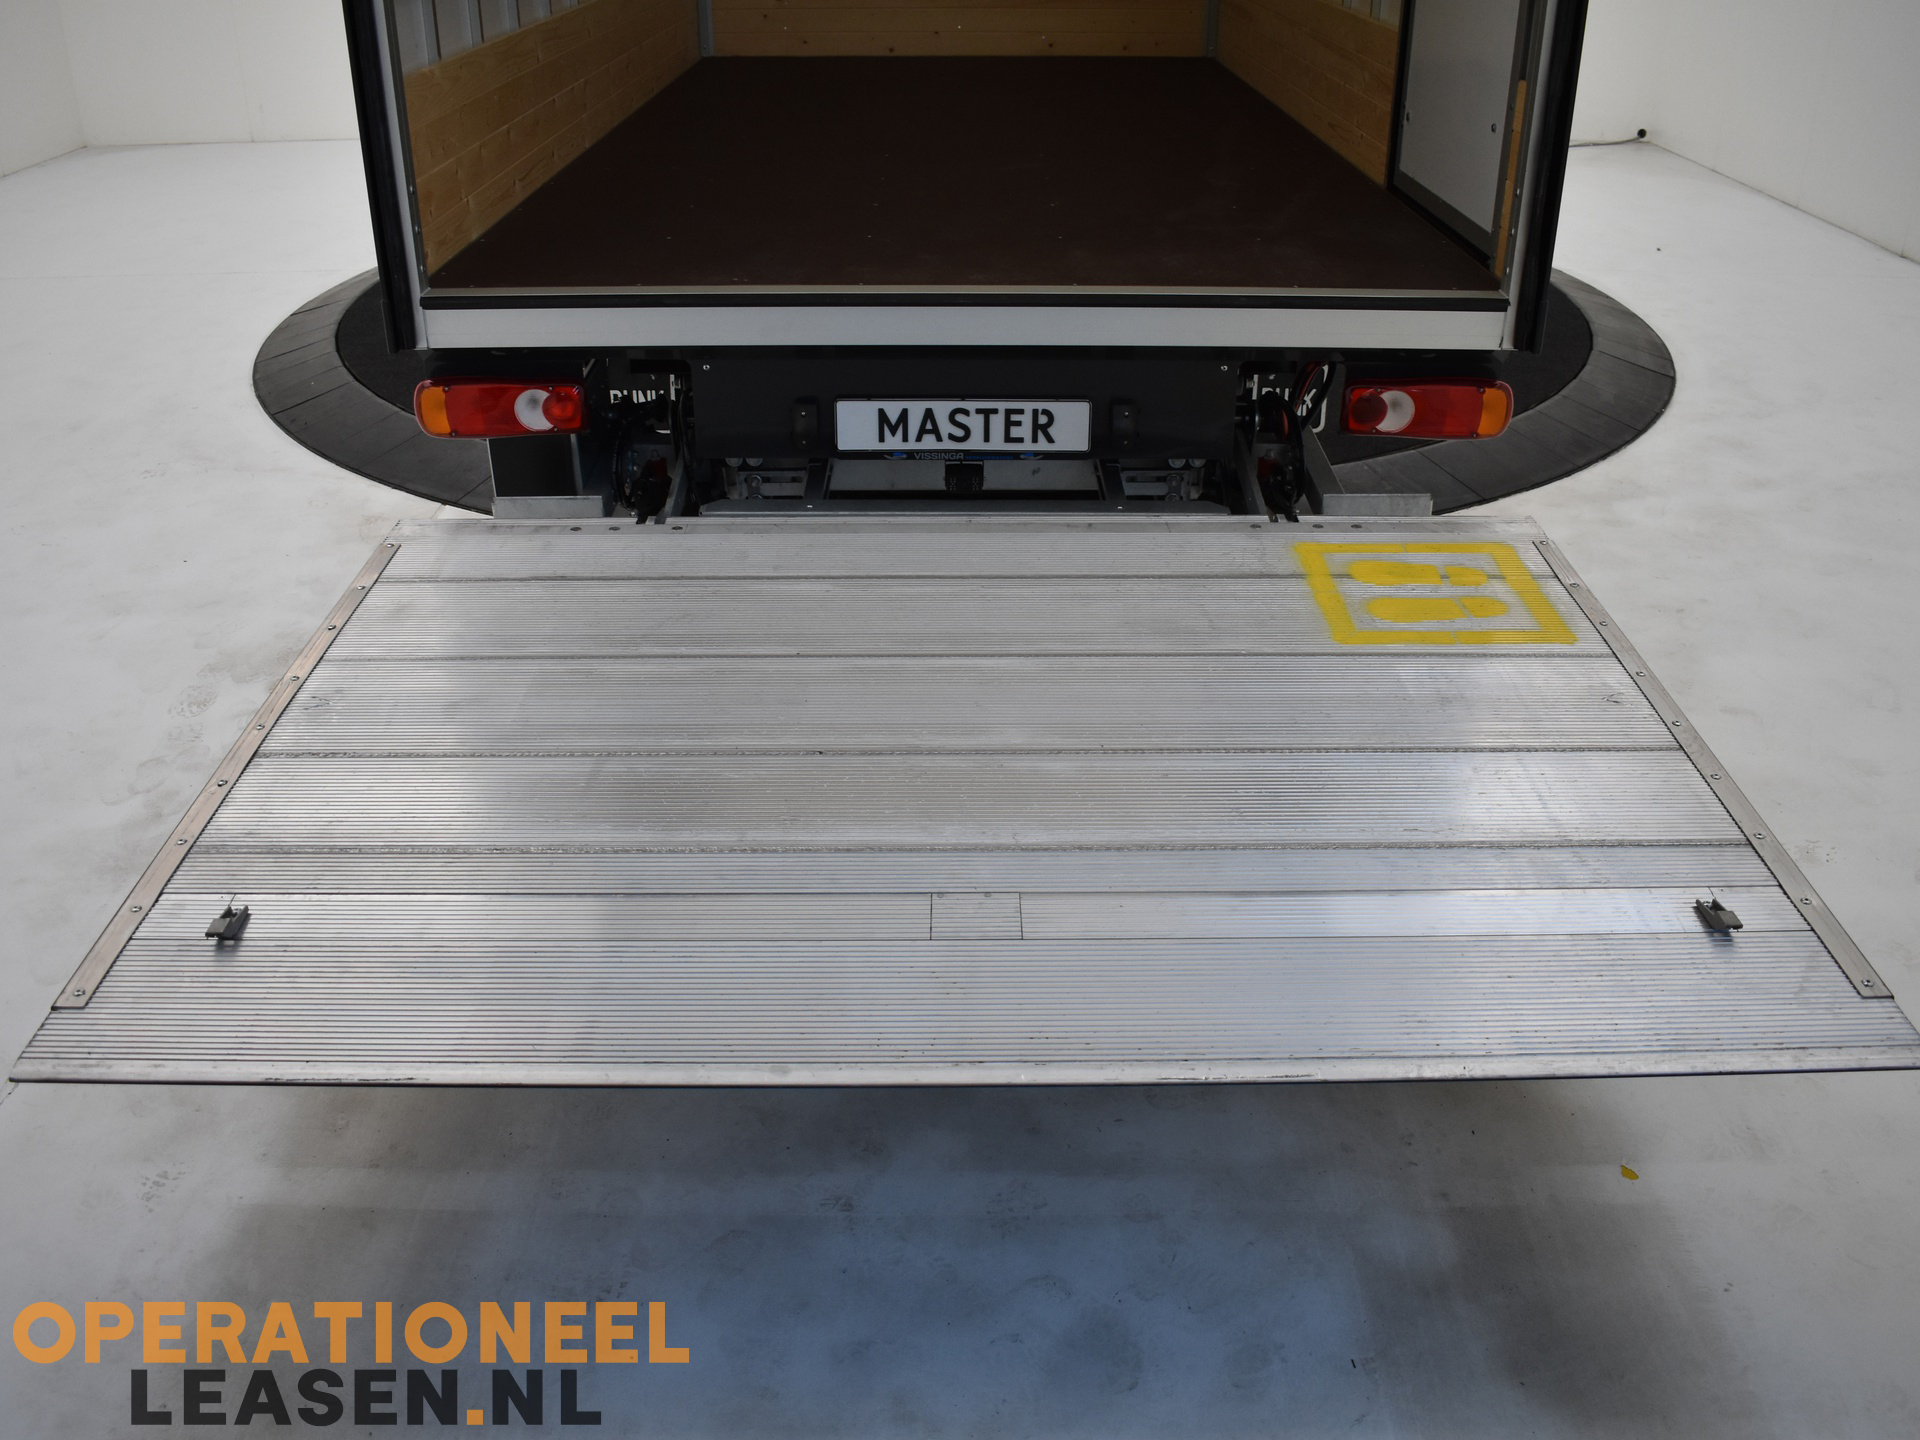 Operational lease zwarte bakwagen-9